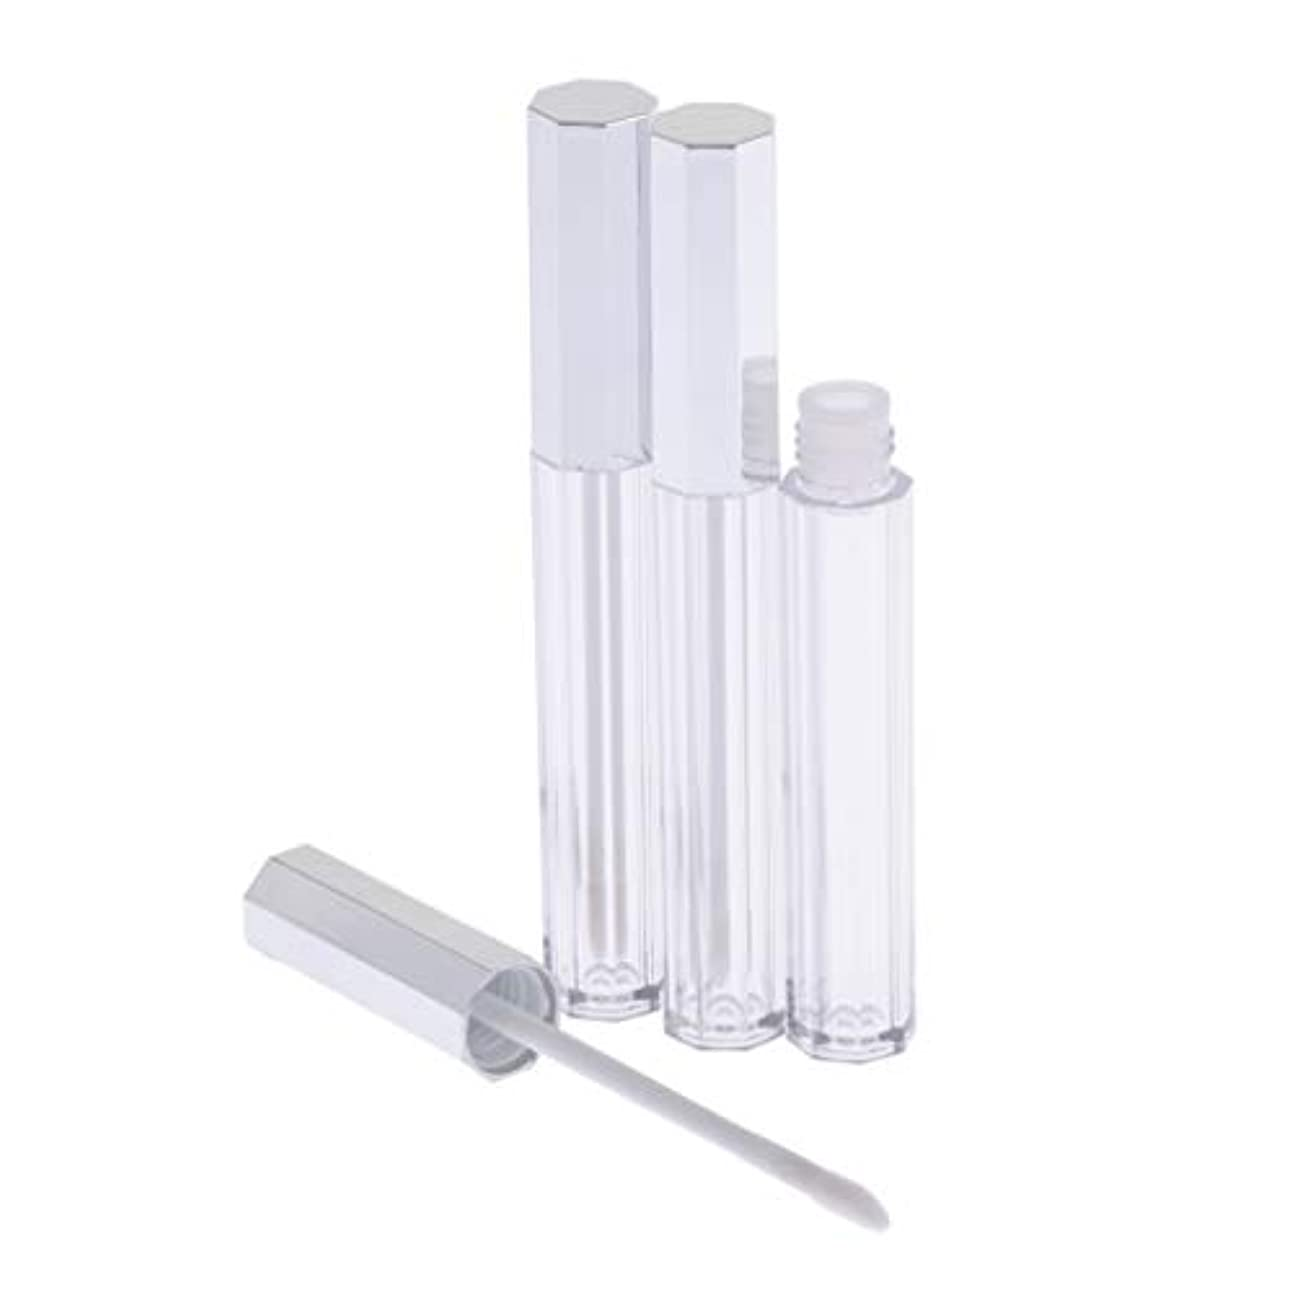 T TOOYFUL リップグロス 容器 チューブ 口紅 容器 空 プラスチック リップグロスボトル 5ml 3個セット